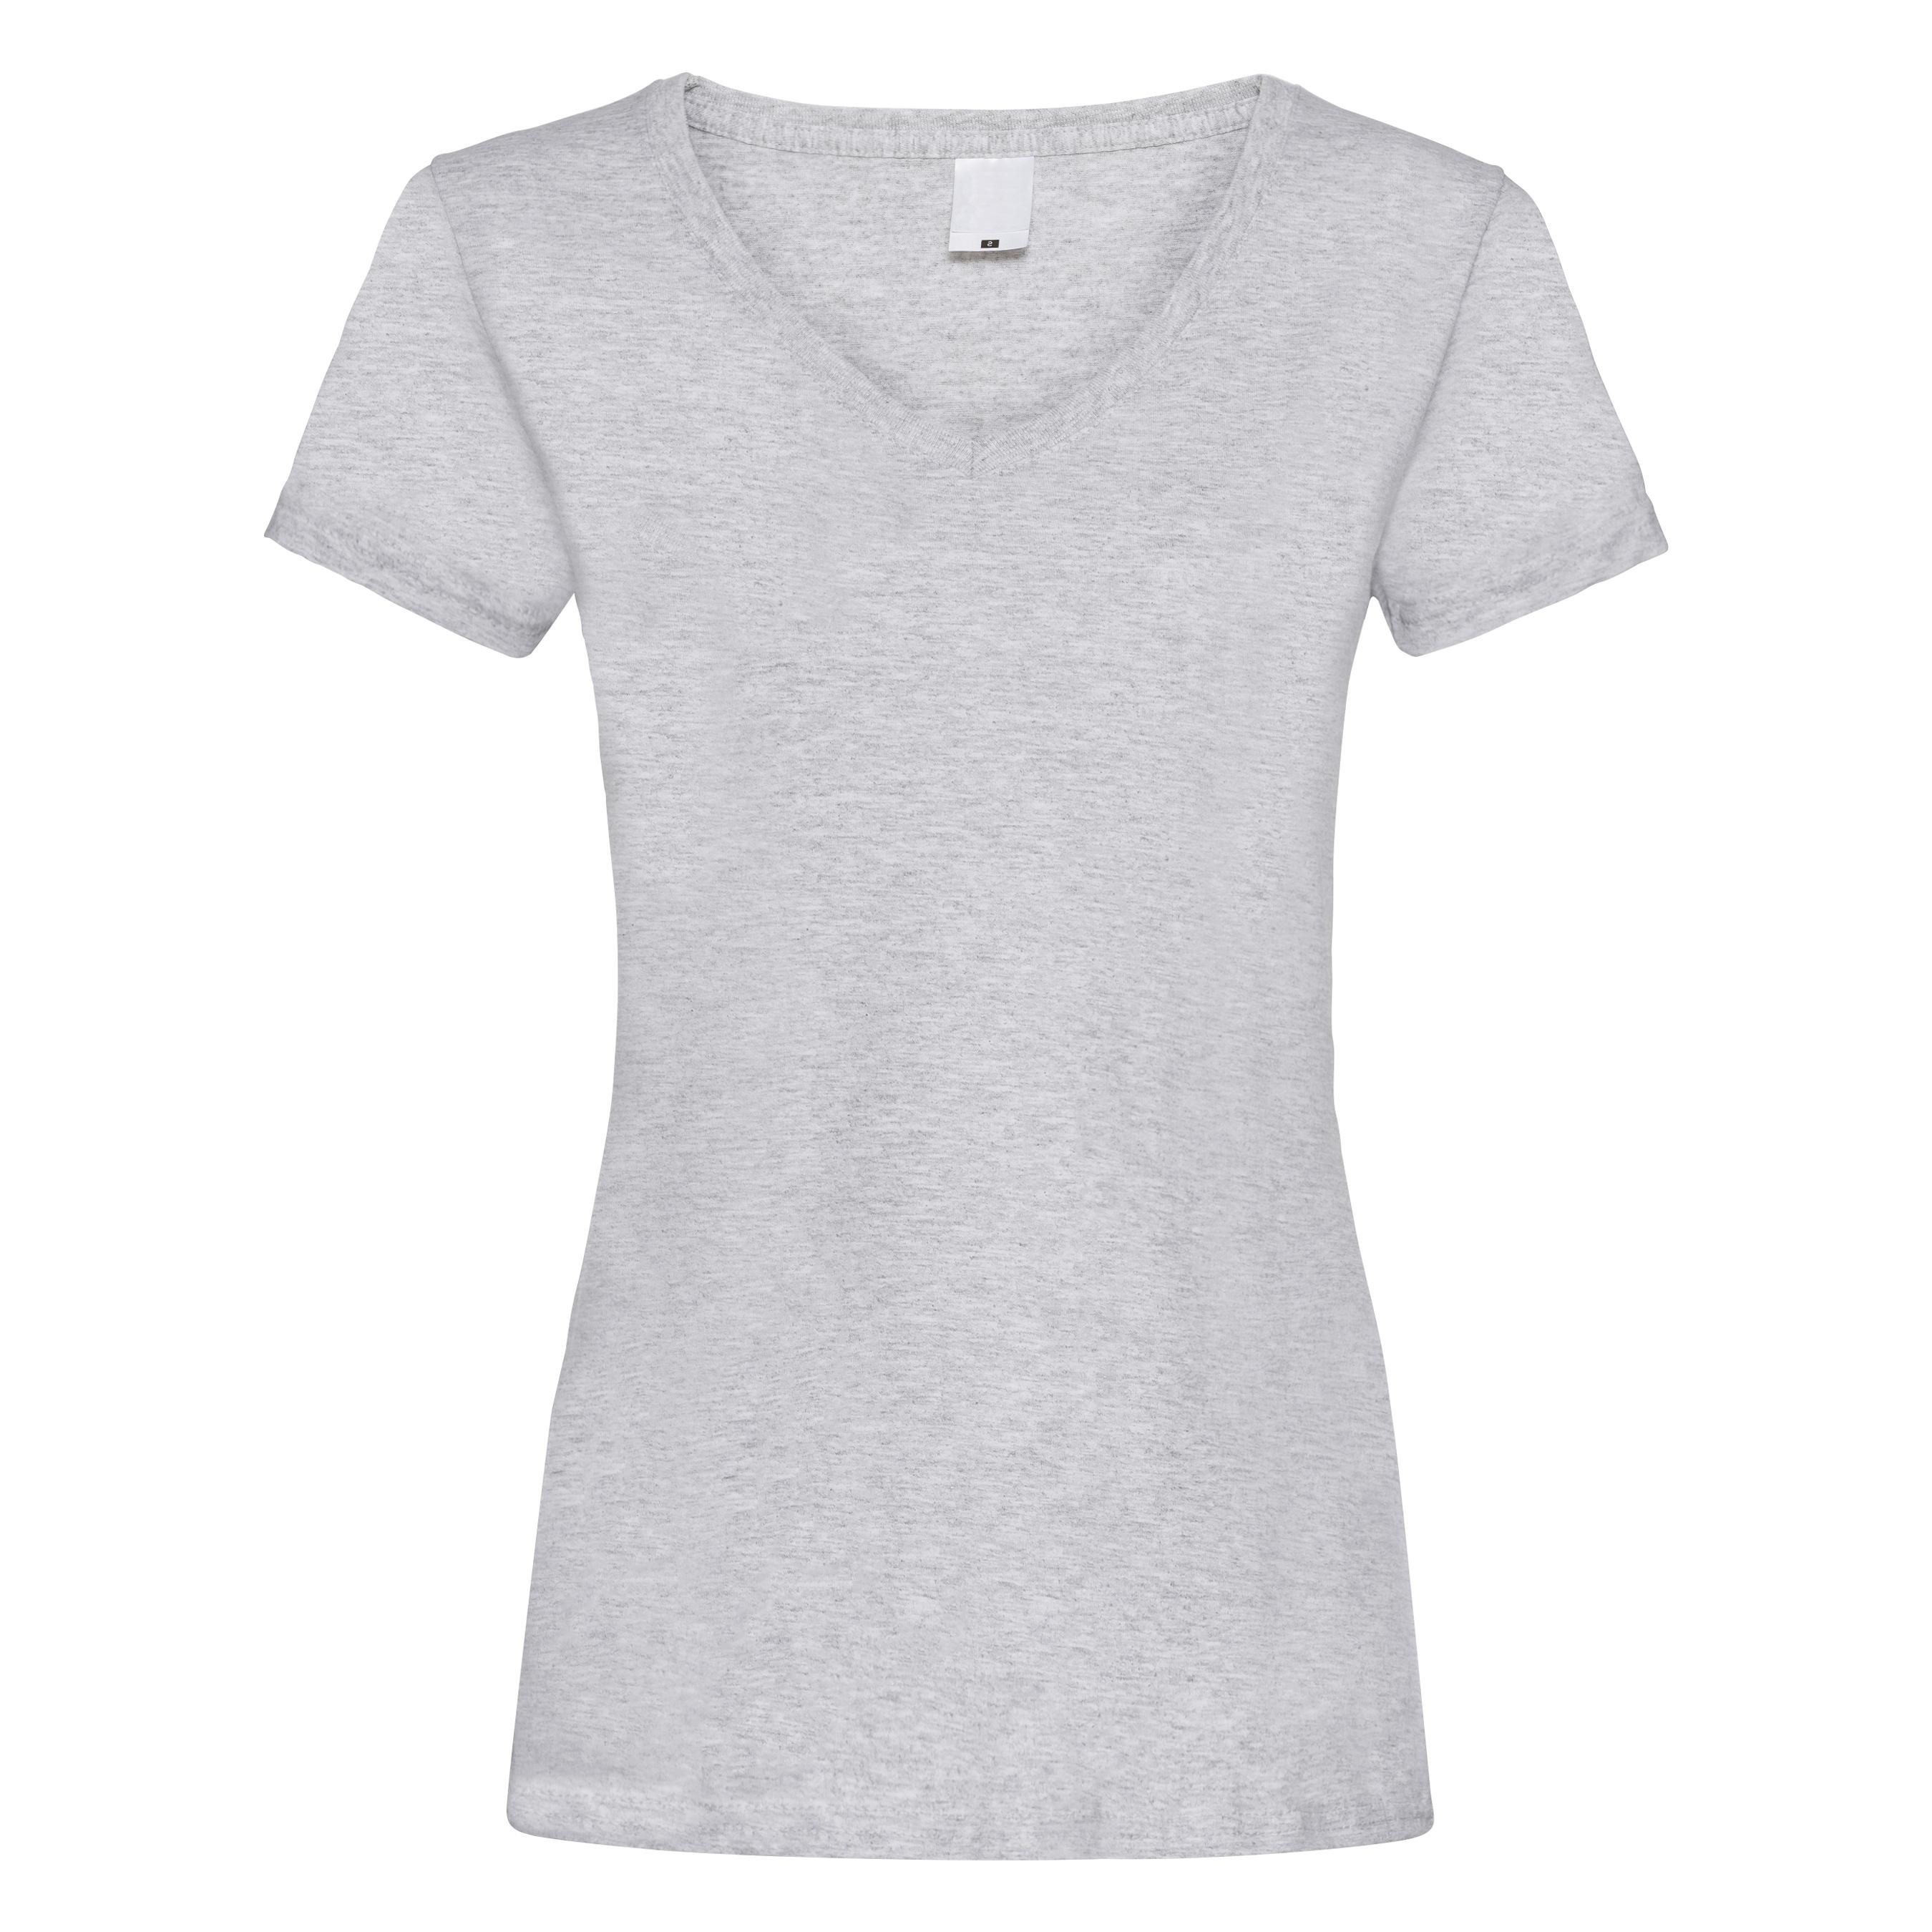 Womens/Ladies Value Fitted V-Neck Short Sleeve Casual T-Shirt (Medium) (Grey Marl)